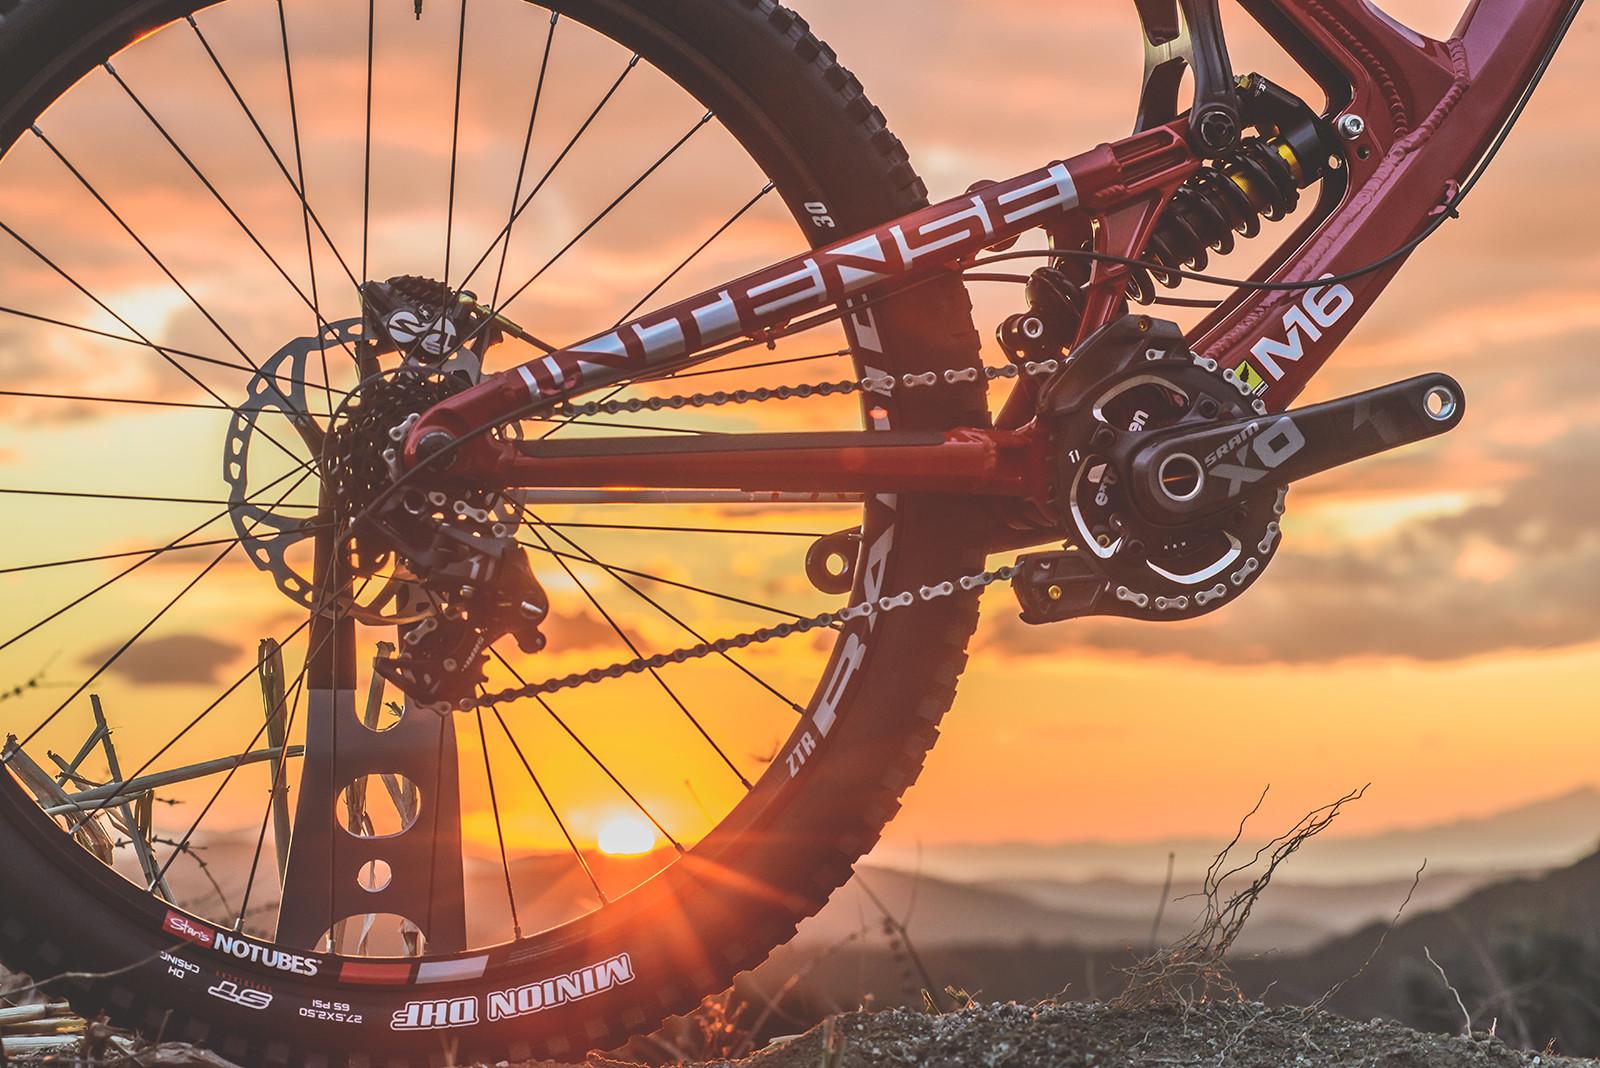 31a5ea332dc First Look: 2016 Intense M16 Downhill Bike - The Next Gen of M ...